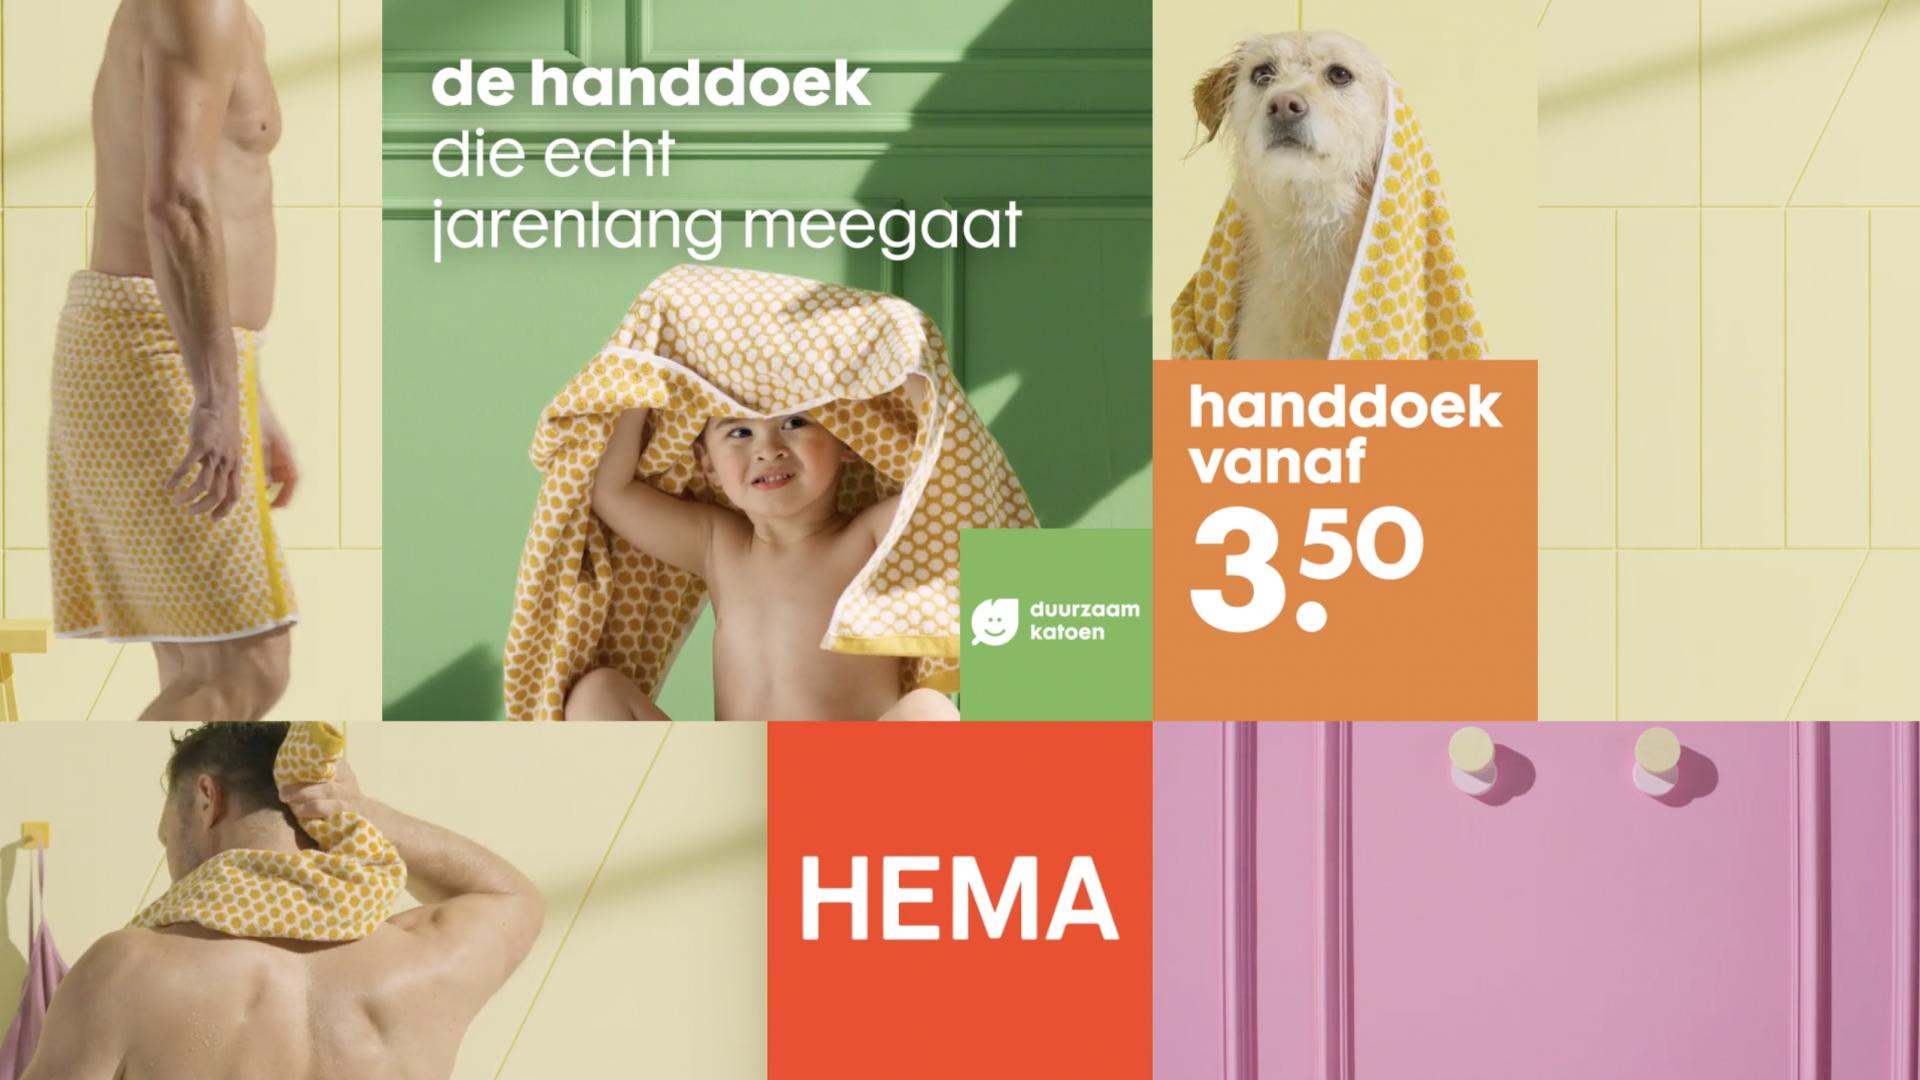 New hema campaign by Tom Joye & Inès beeftink